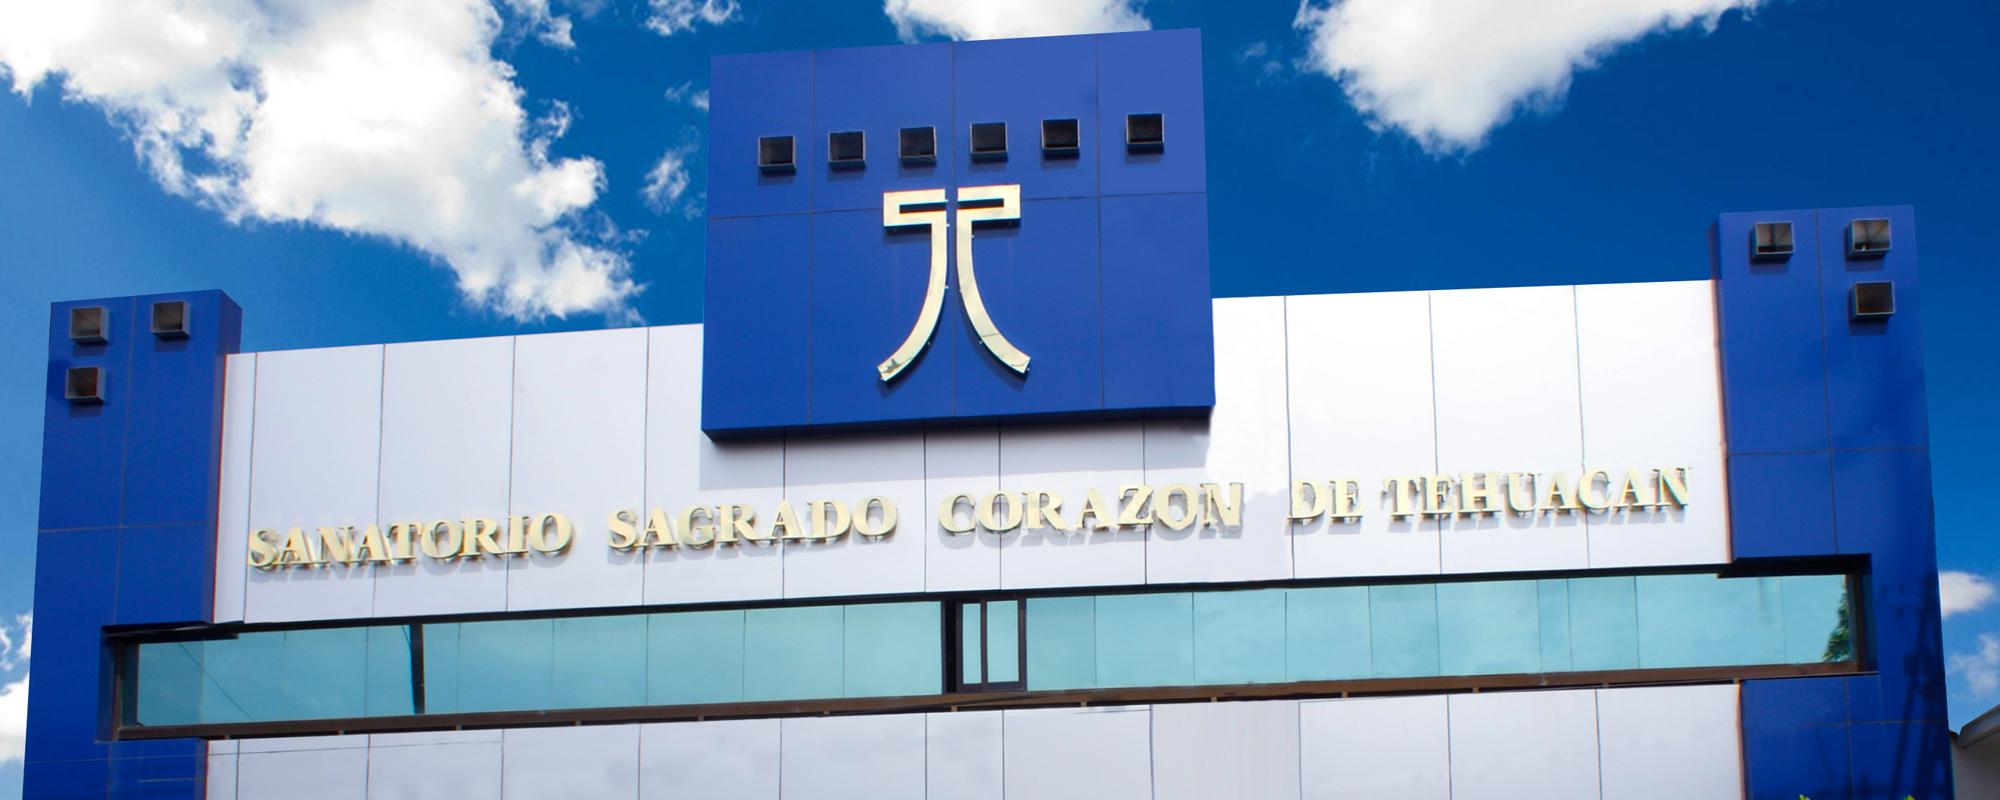 Sanatorio Sagrado Corazón de Tehuacán